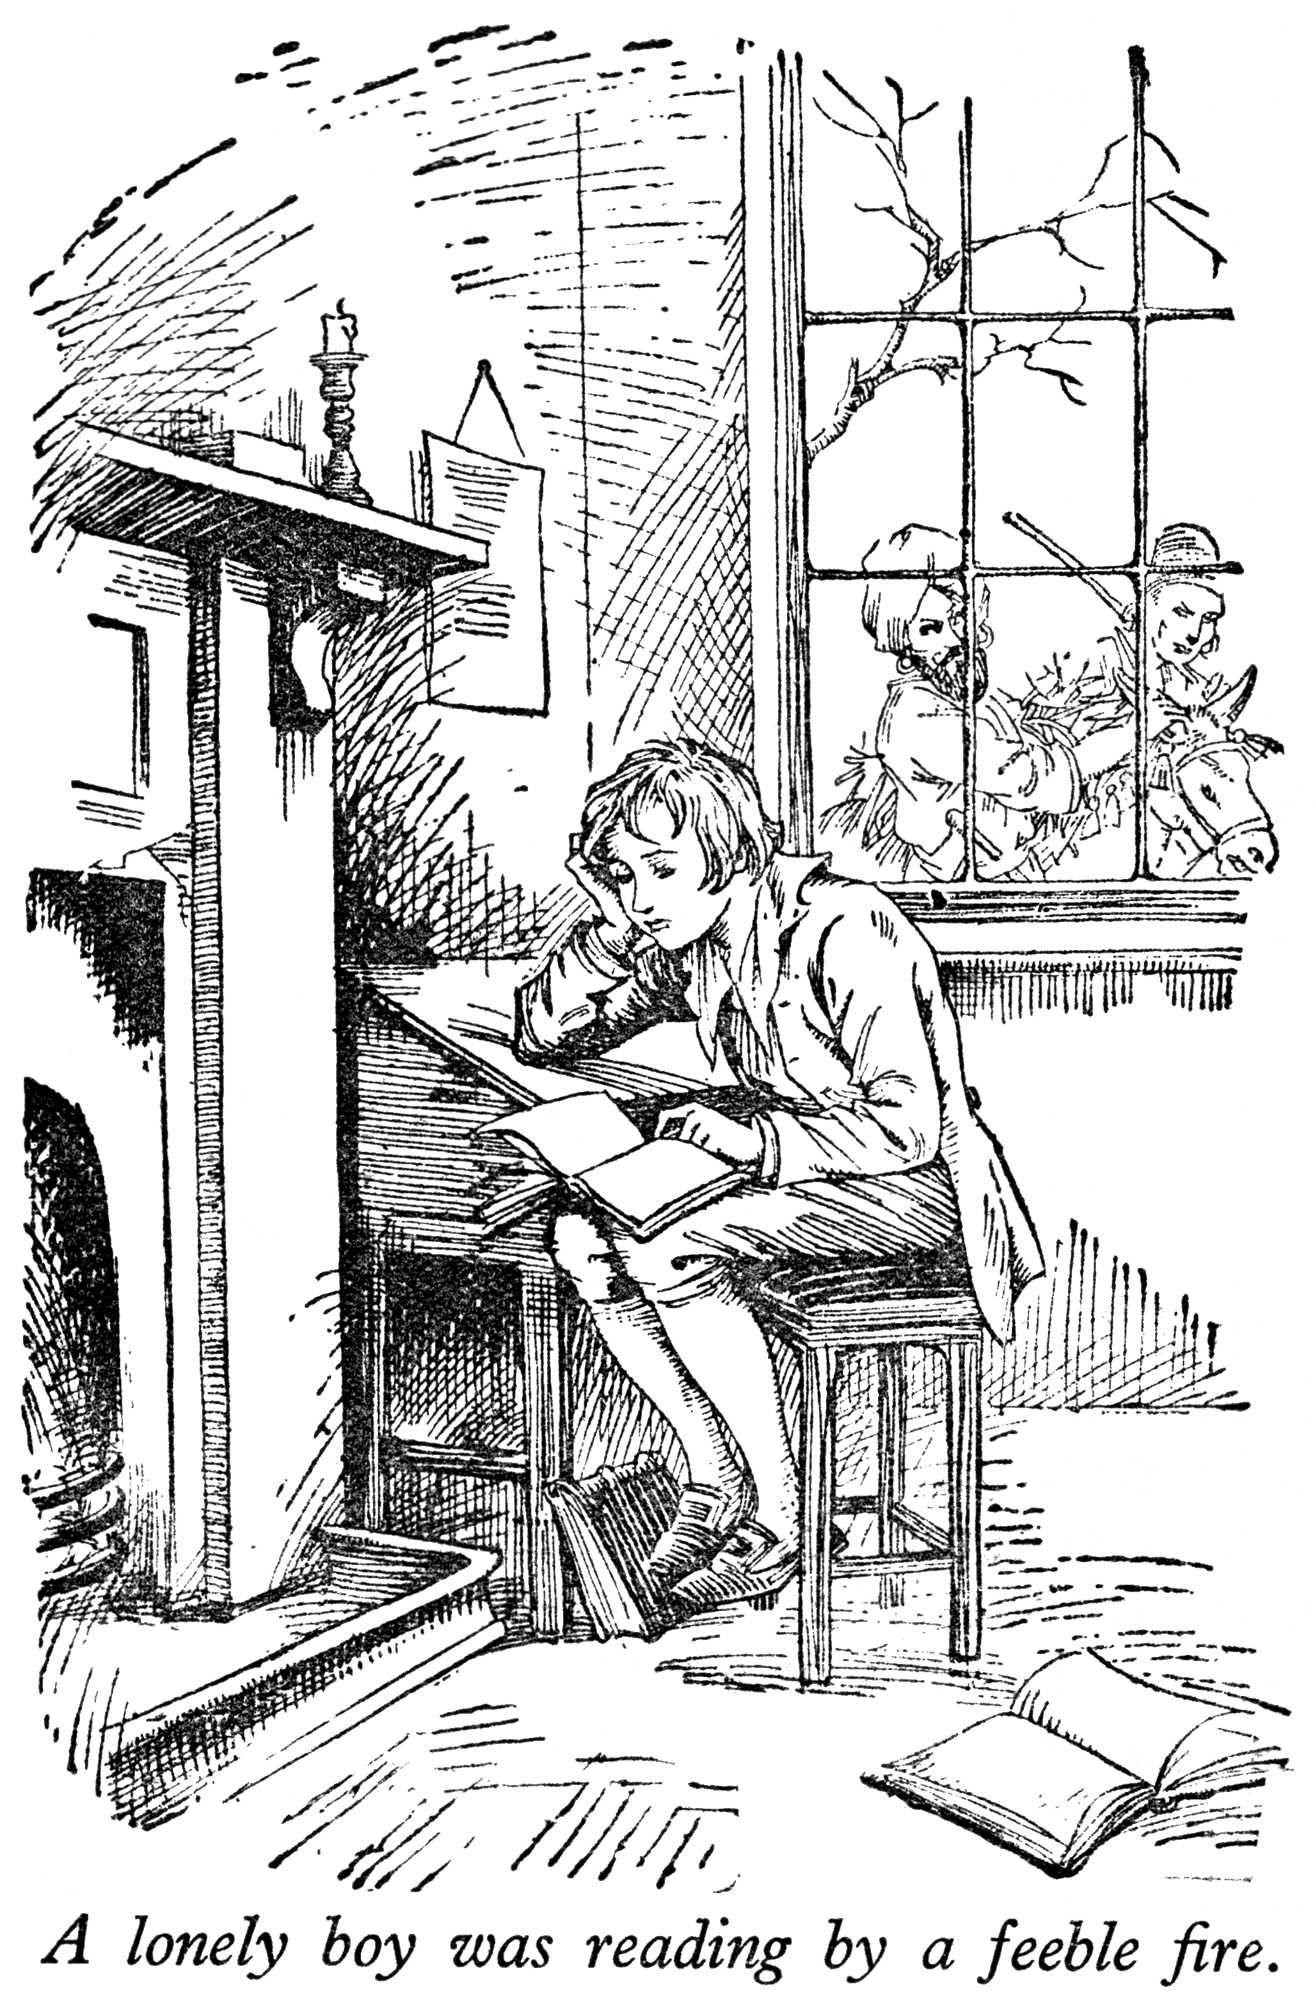 Childrens392 2000 Jpg 1 315 2 000 Pixels Young Ebenezer Scrooge Charles Dickens Christmas Dickens Christmas Carol Christmas Carol